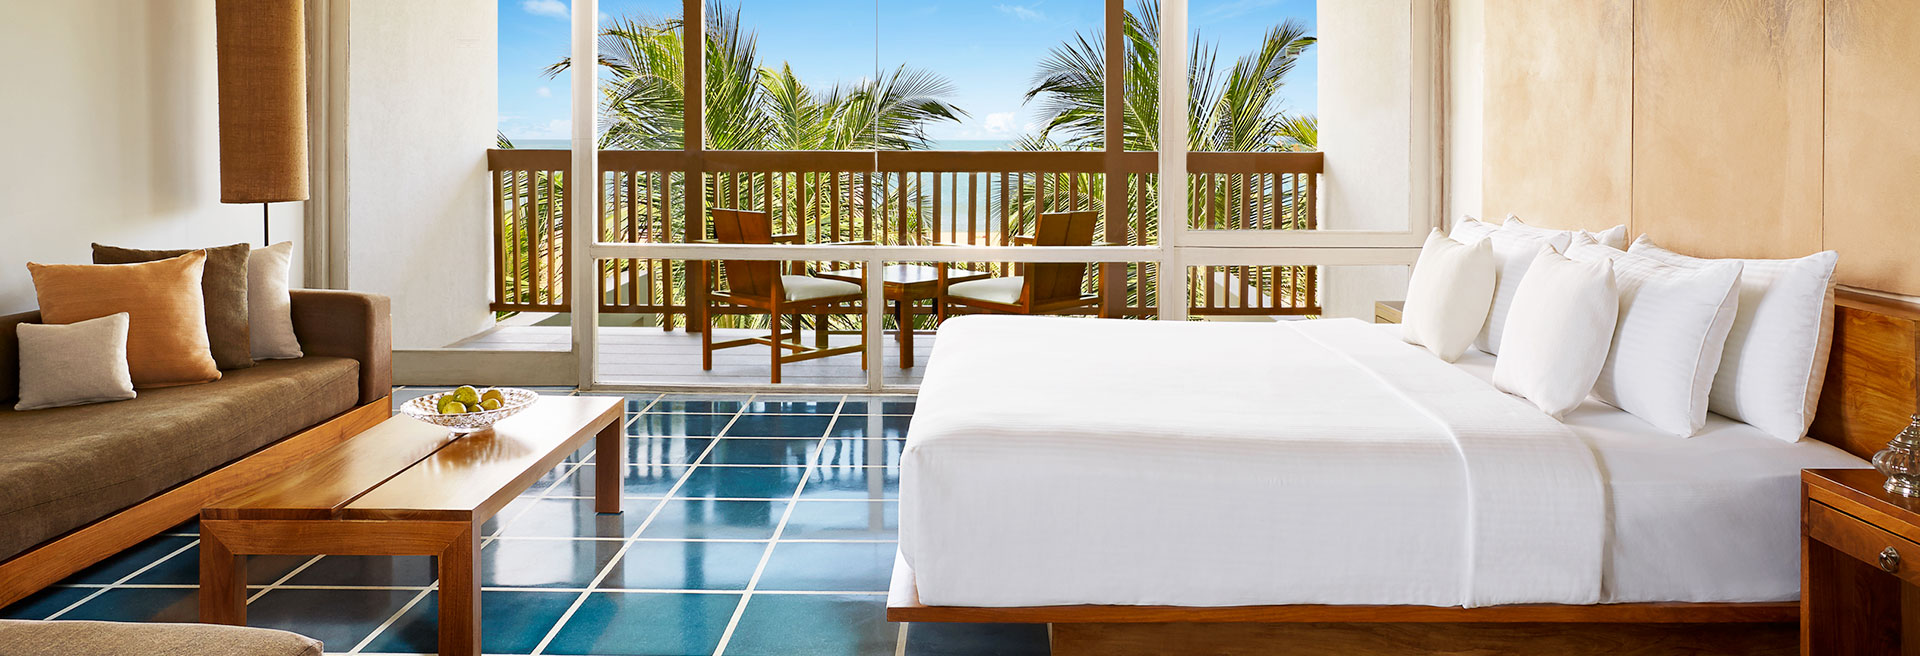 Jetwing Hotels Sri Lanka